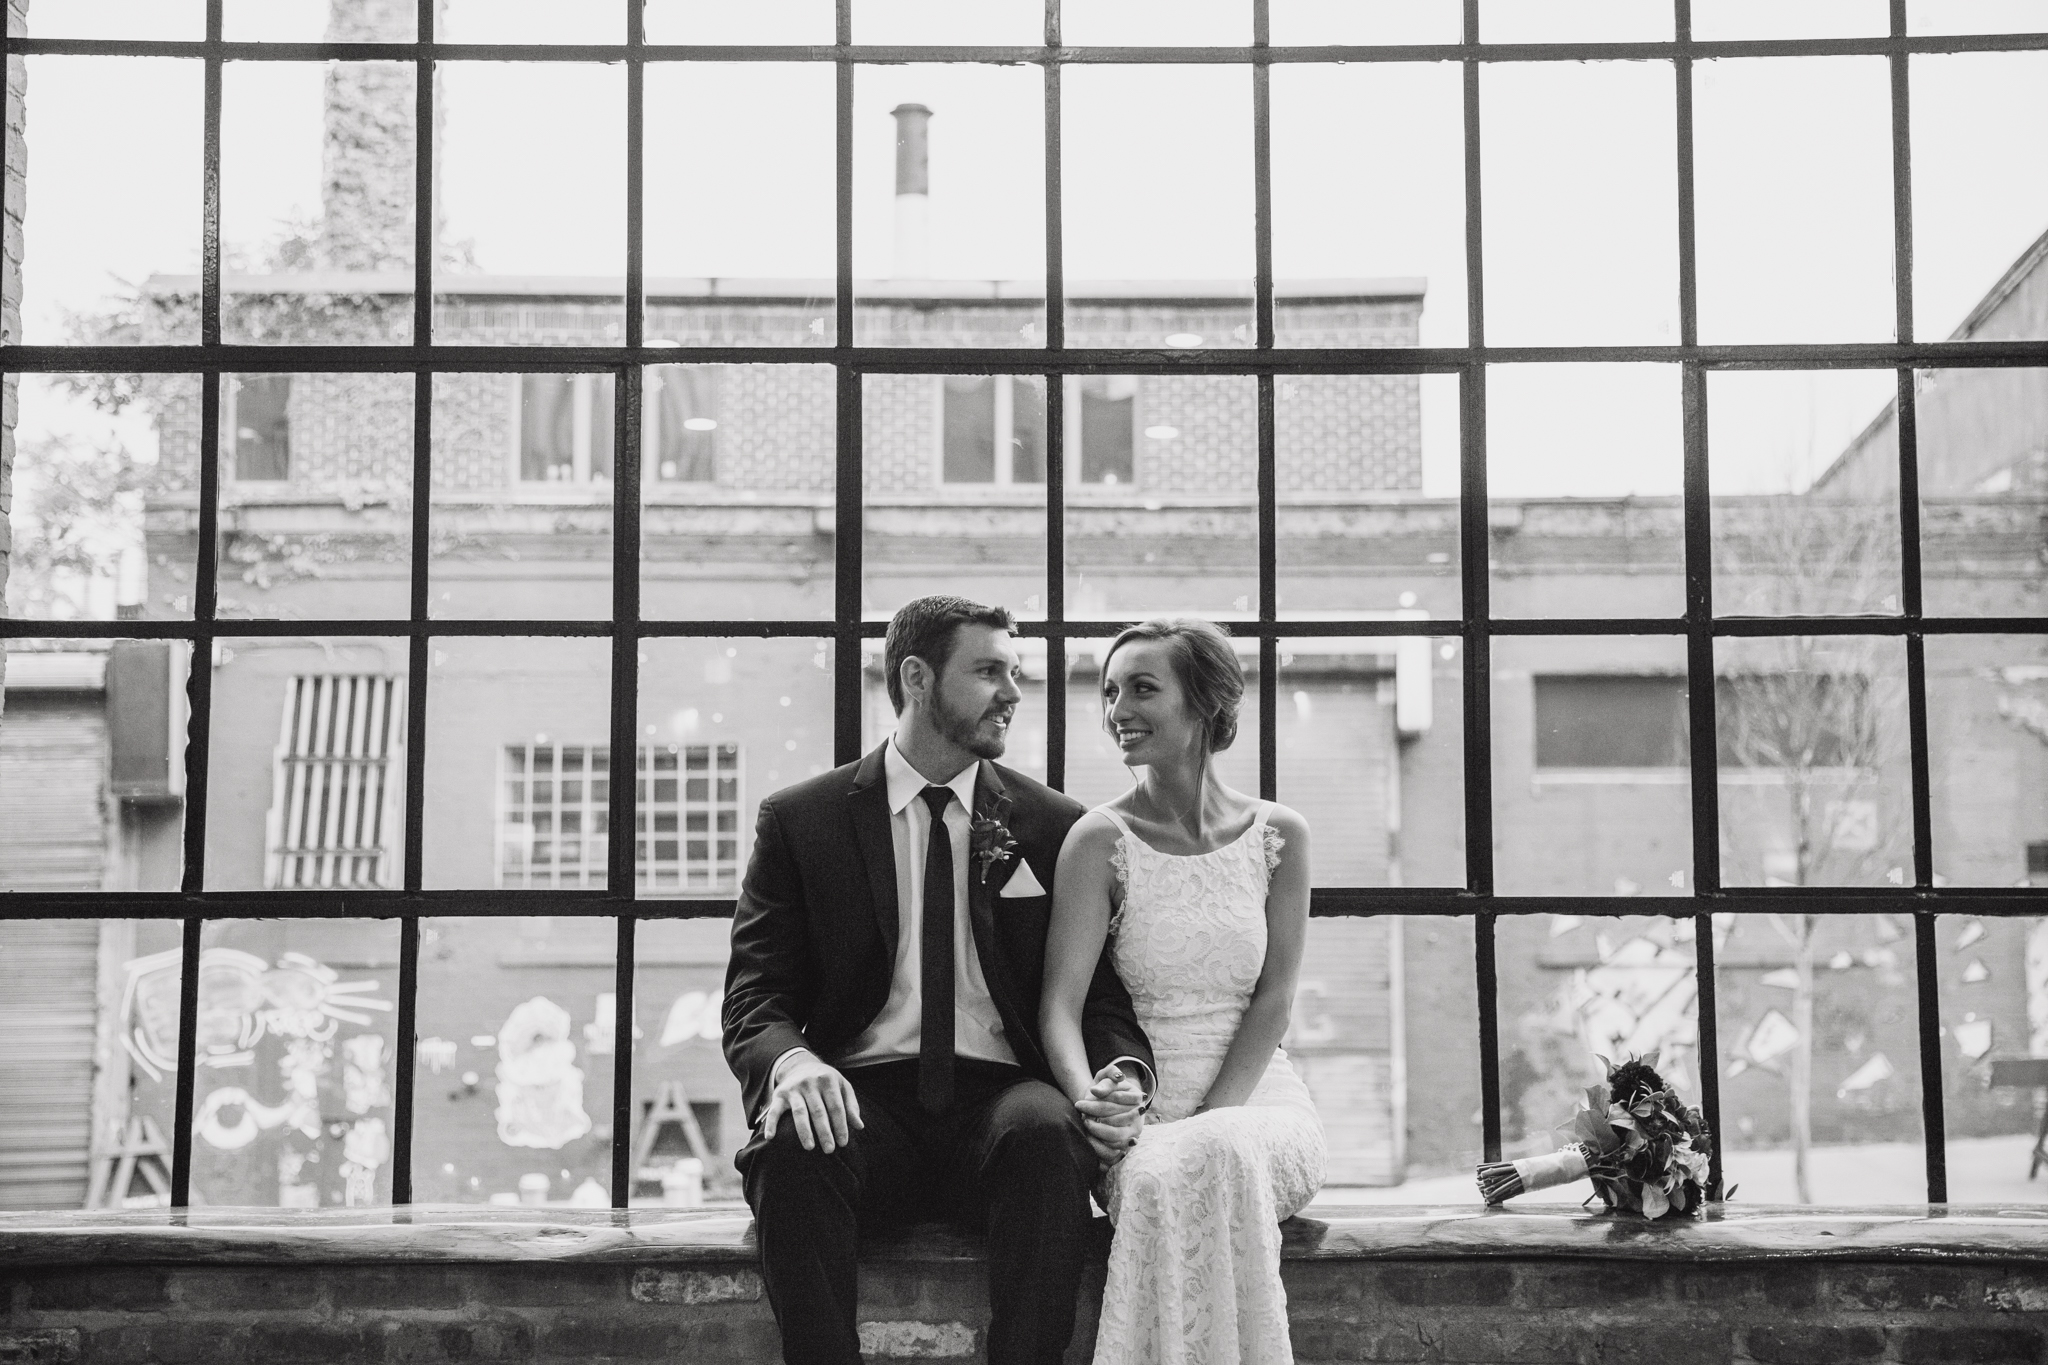 26-bridge-wedding-brooklyn-054.JPG